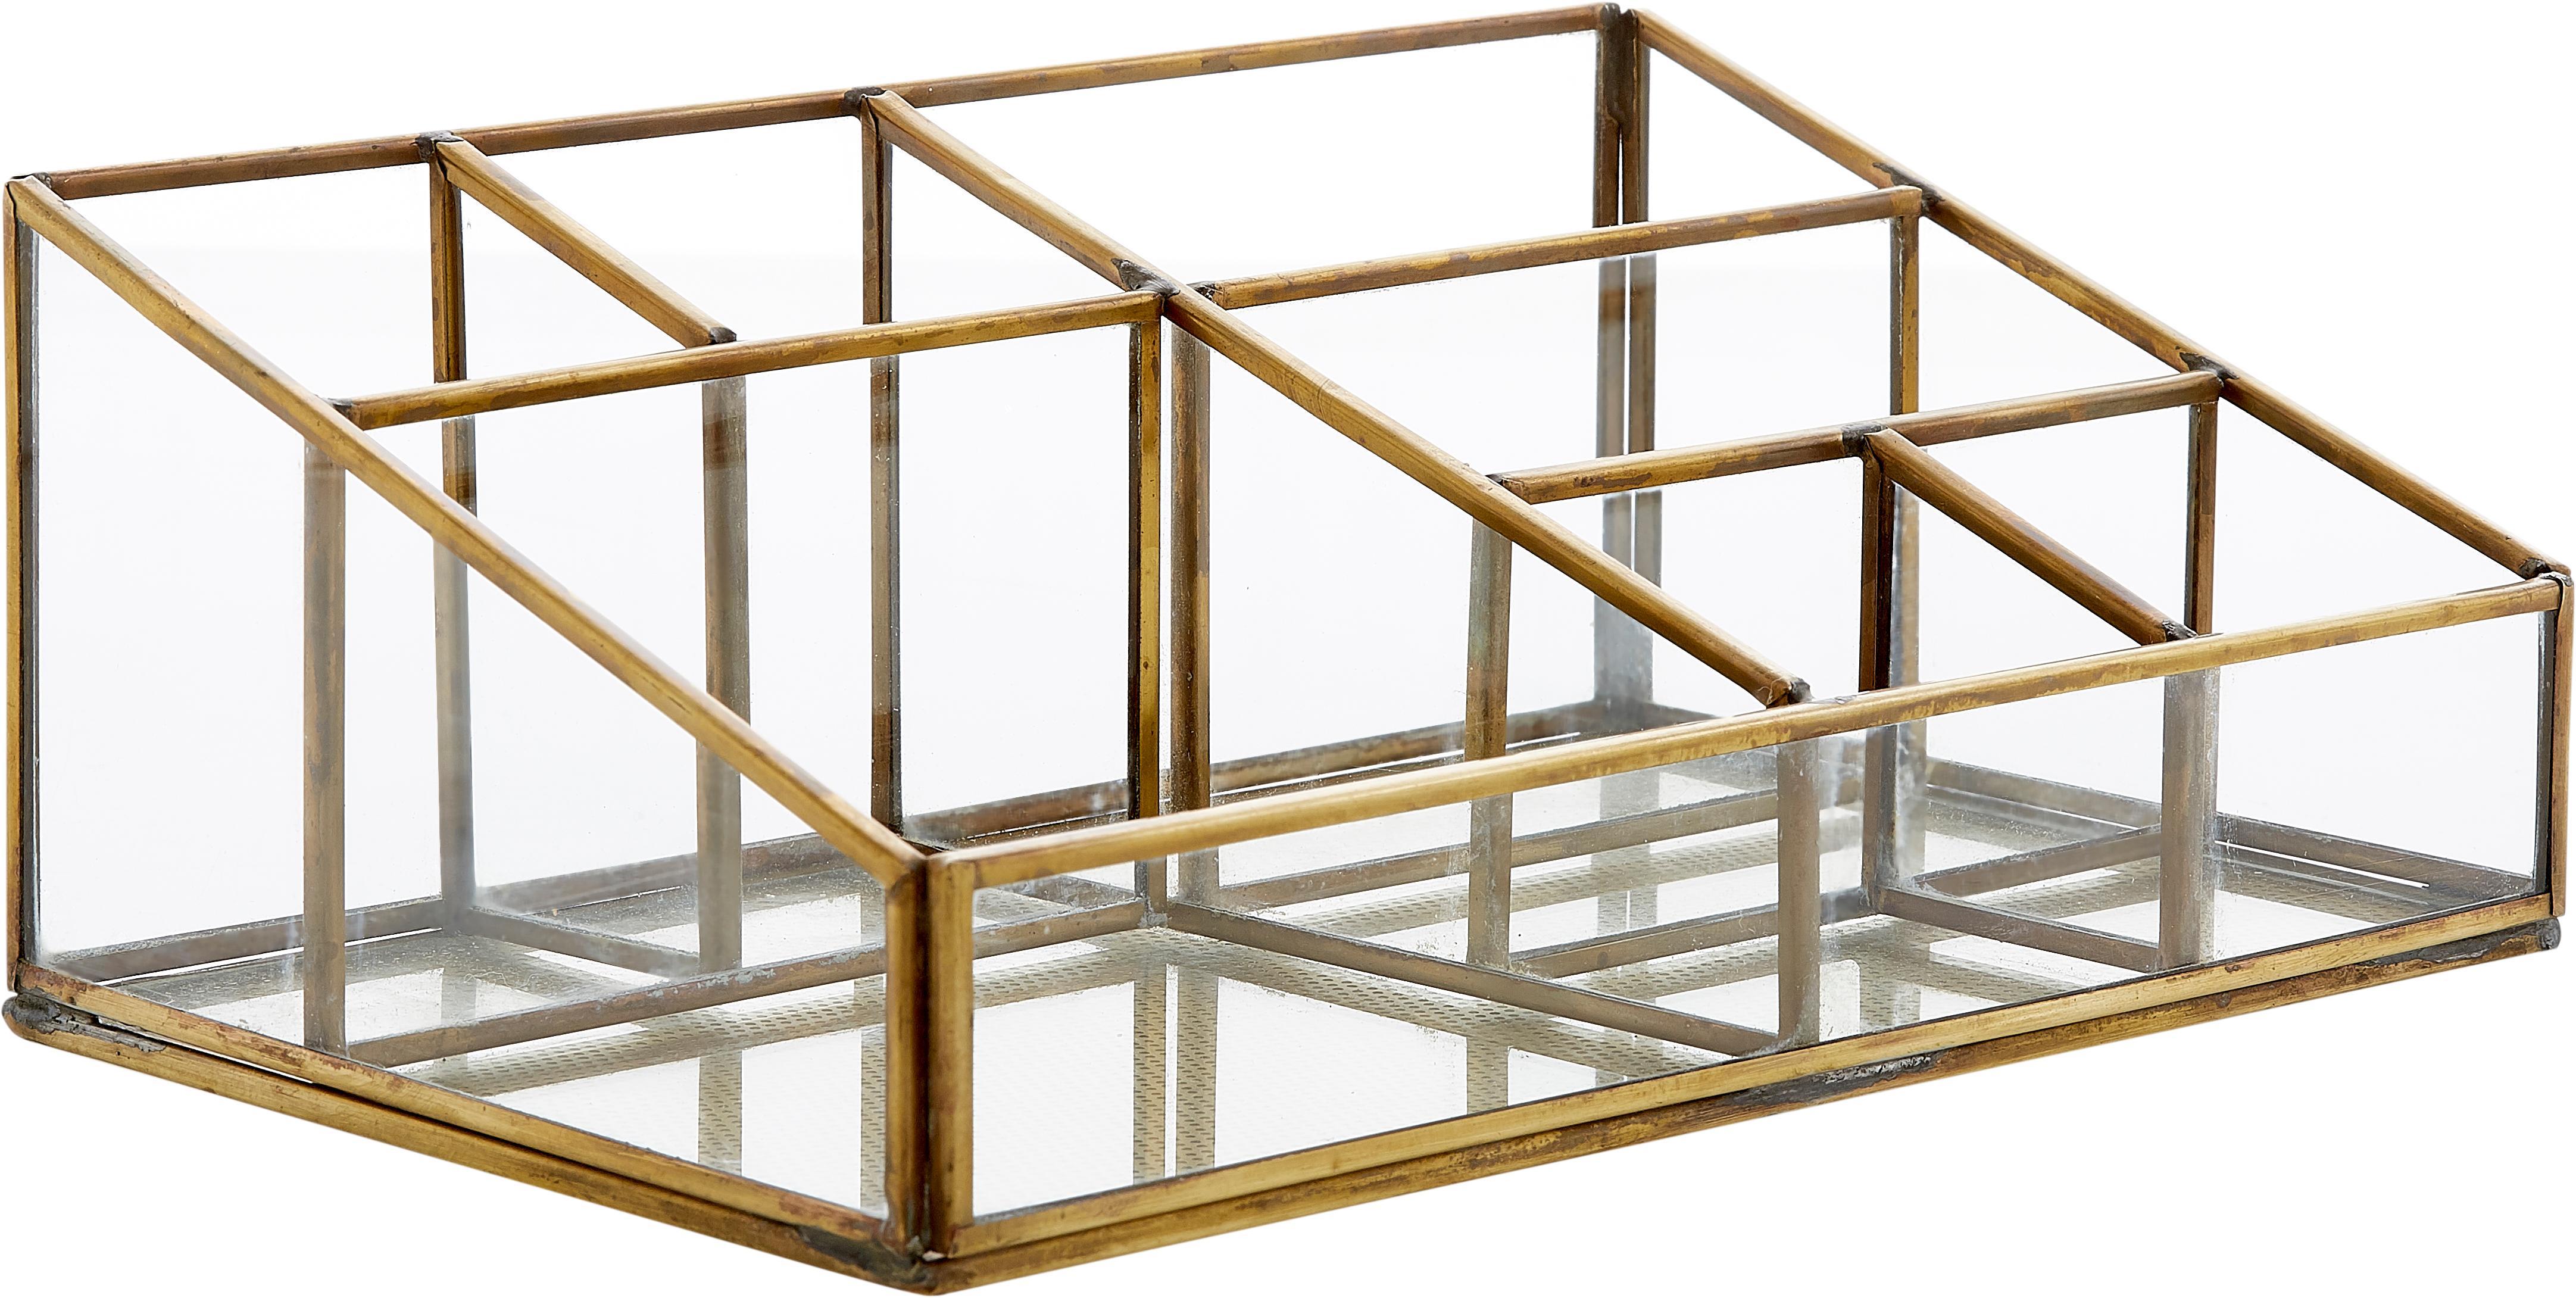 Organizer Sorted, Rahmen: Metall, beschichtet, Messing, 24 x 9 cm